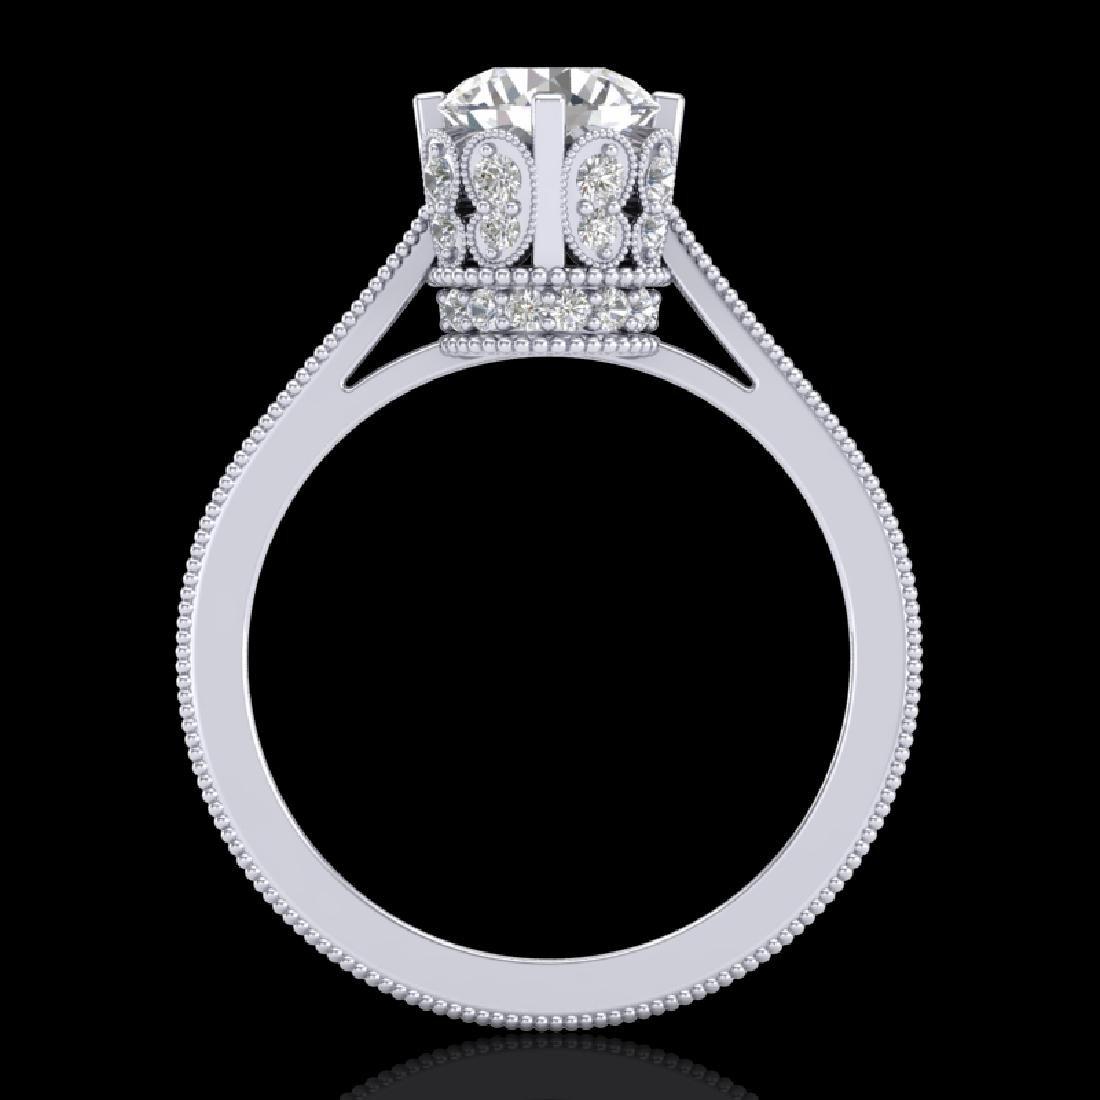 1.5 CTW VS/SI Diamond Art Deco Ring 18K White Gold - 3